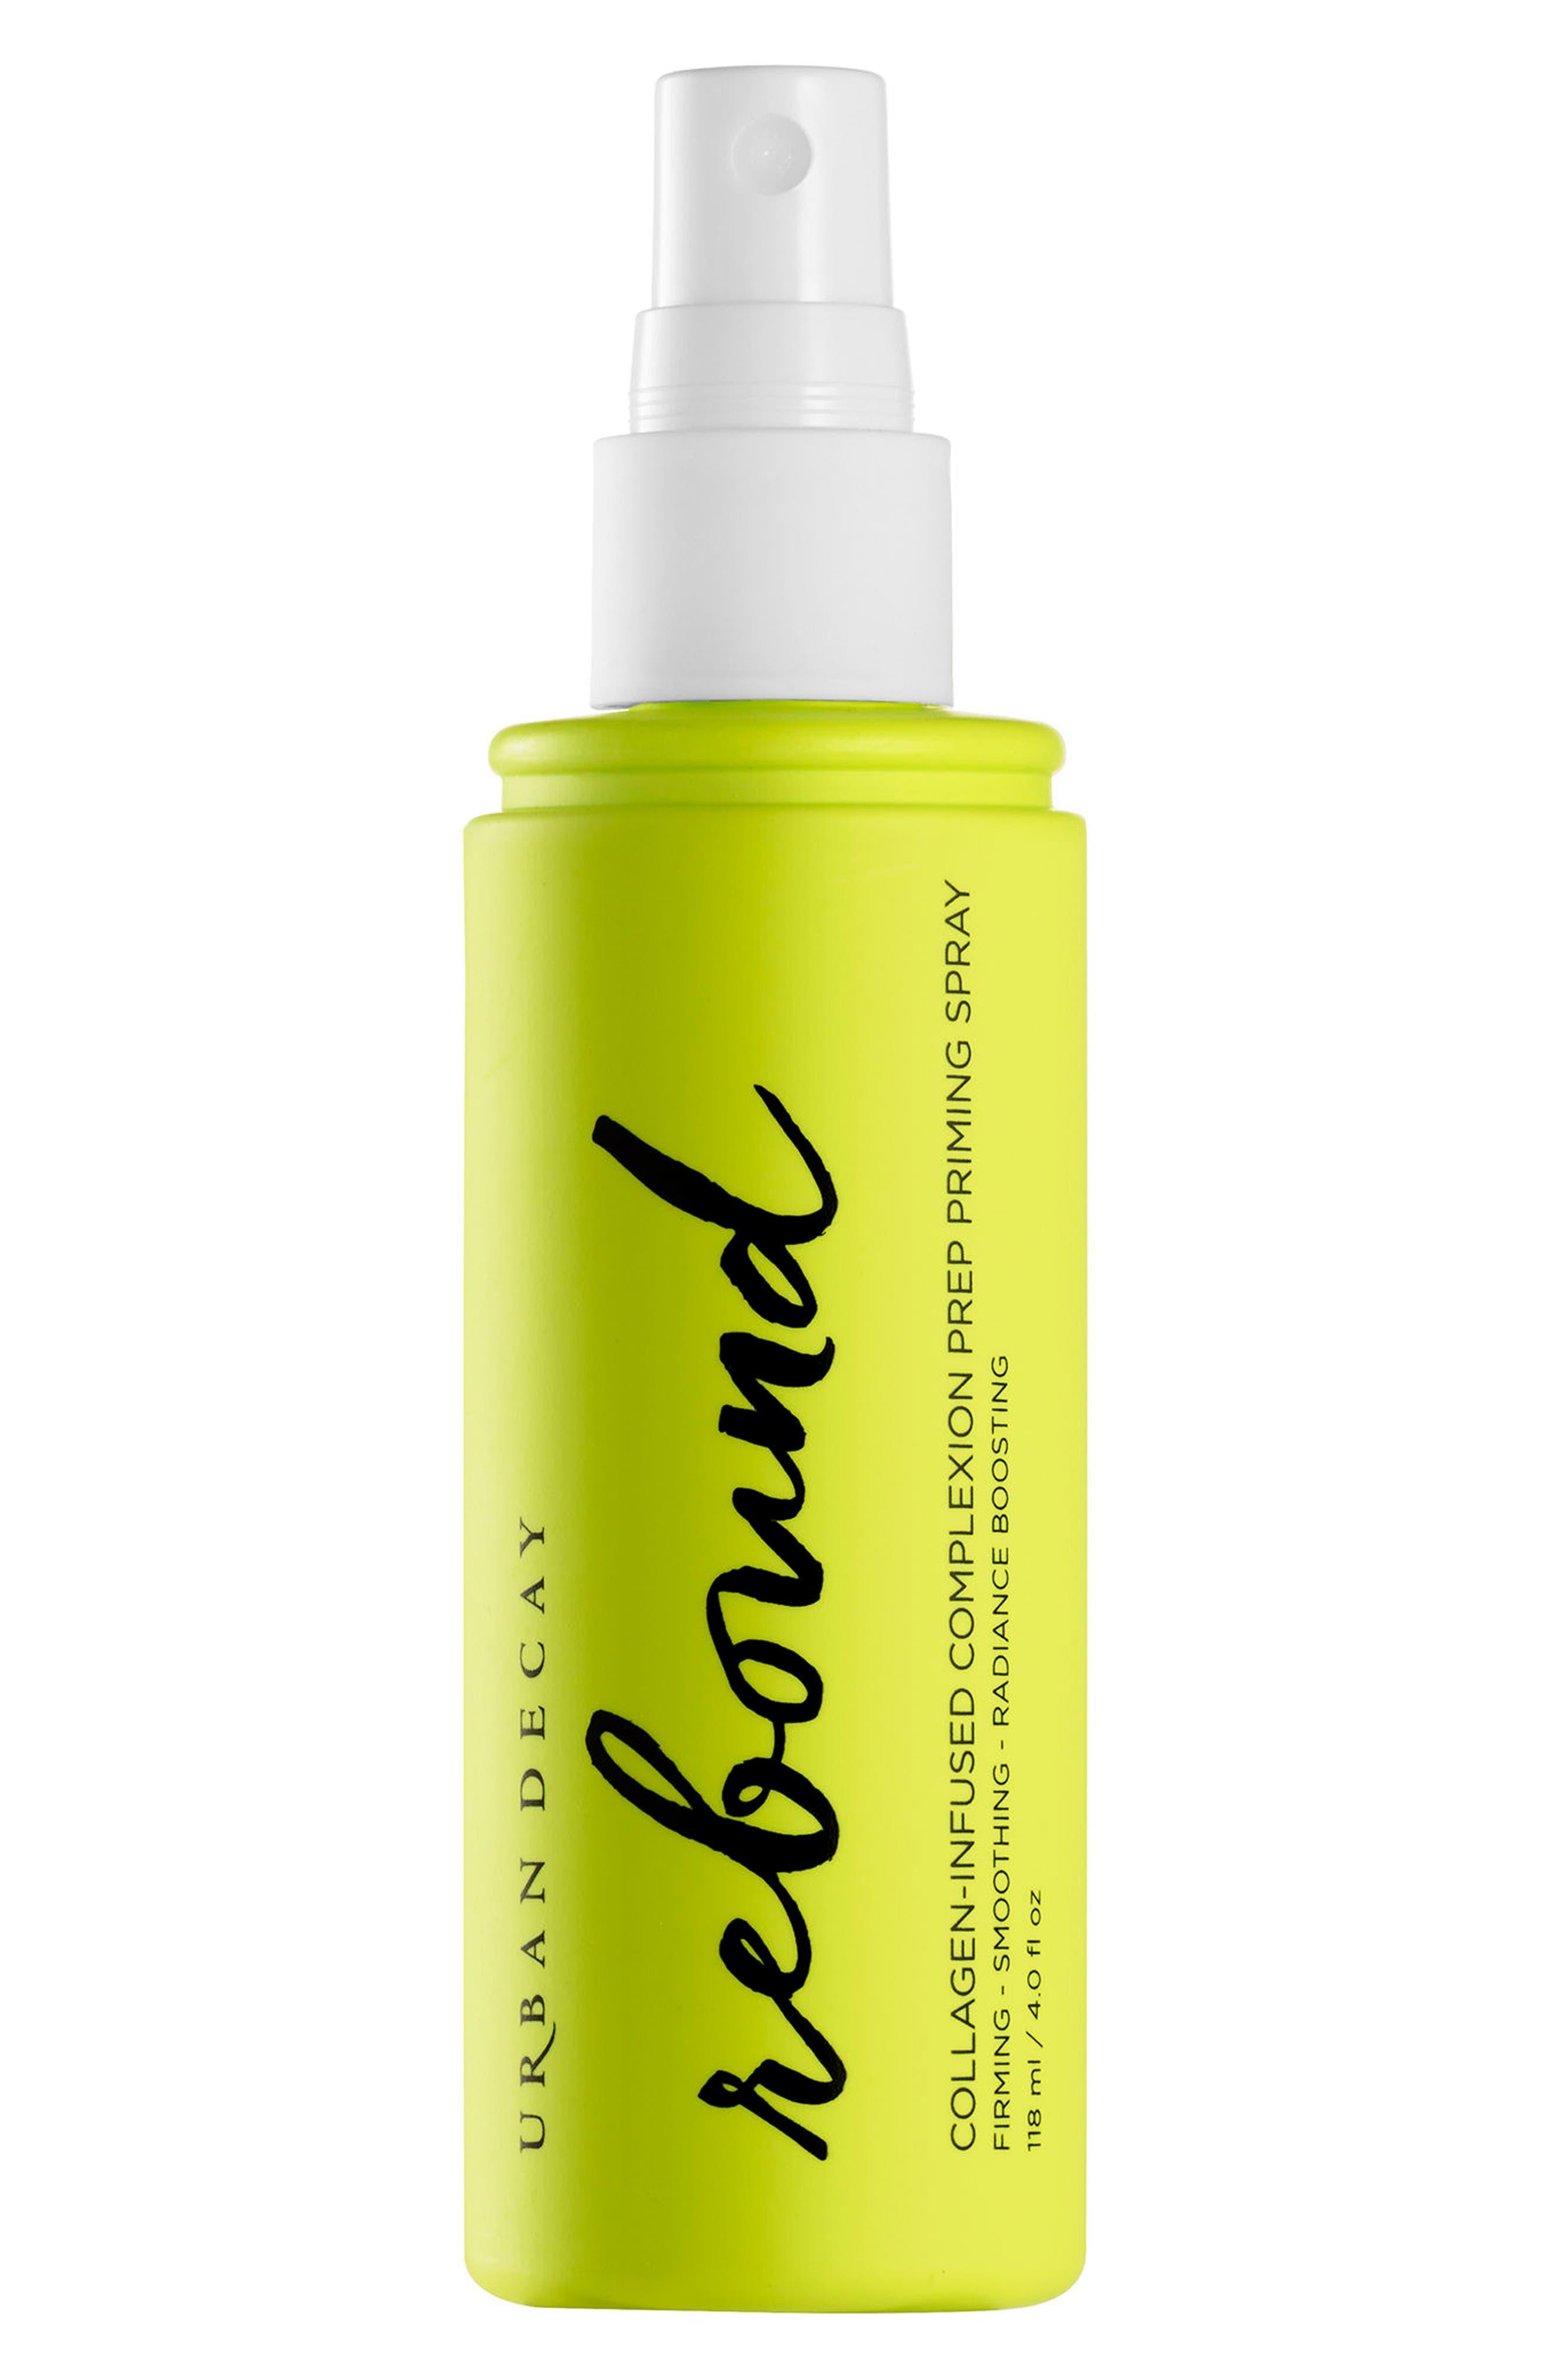 Rebound Collagen-Infused Complexion Prep Priming Spray,                             Alternate thumbnail 2, color,                             No Color